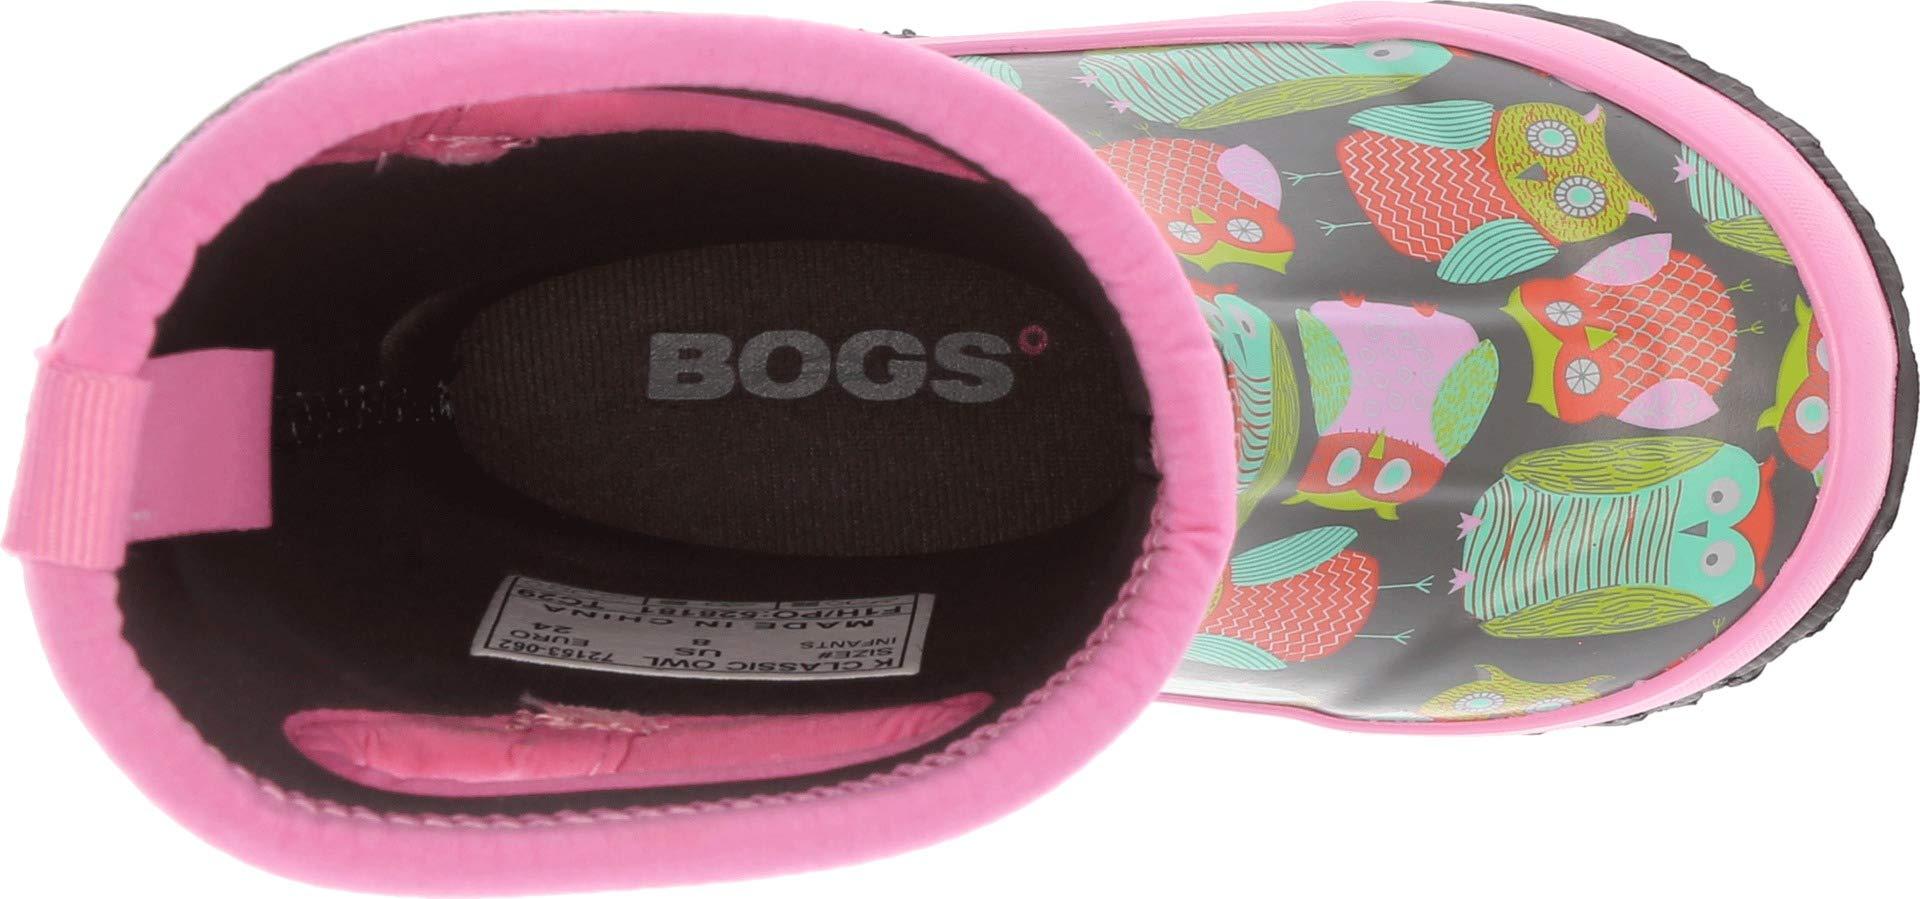 Bogs Kids Baby Girl's Classic Owl (Toddler/Little Kid/Big Kid) Gray Multi 12 M US Little Kid by Bogs (Image #2)